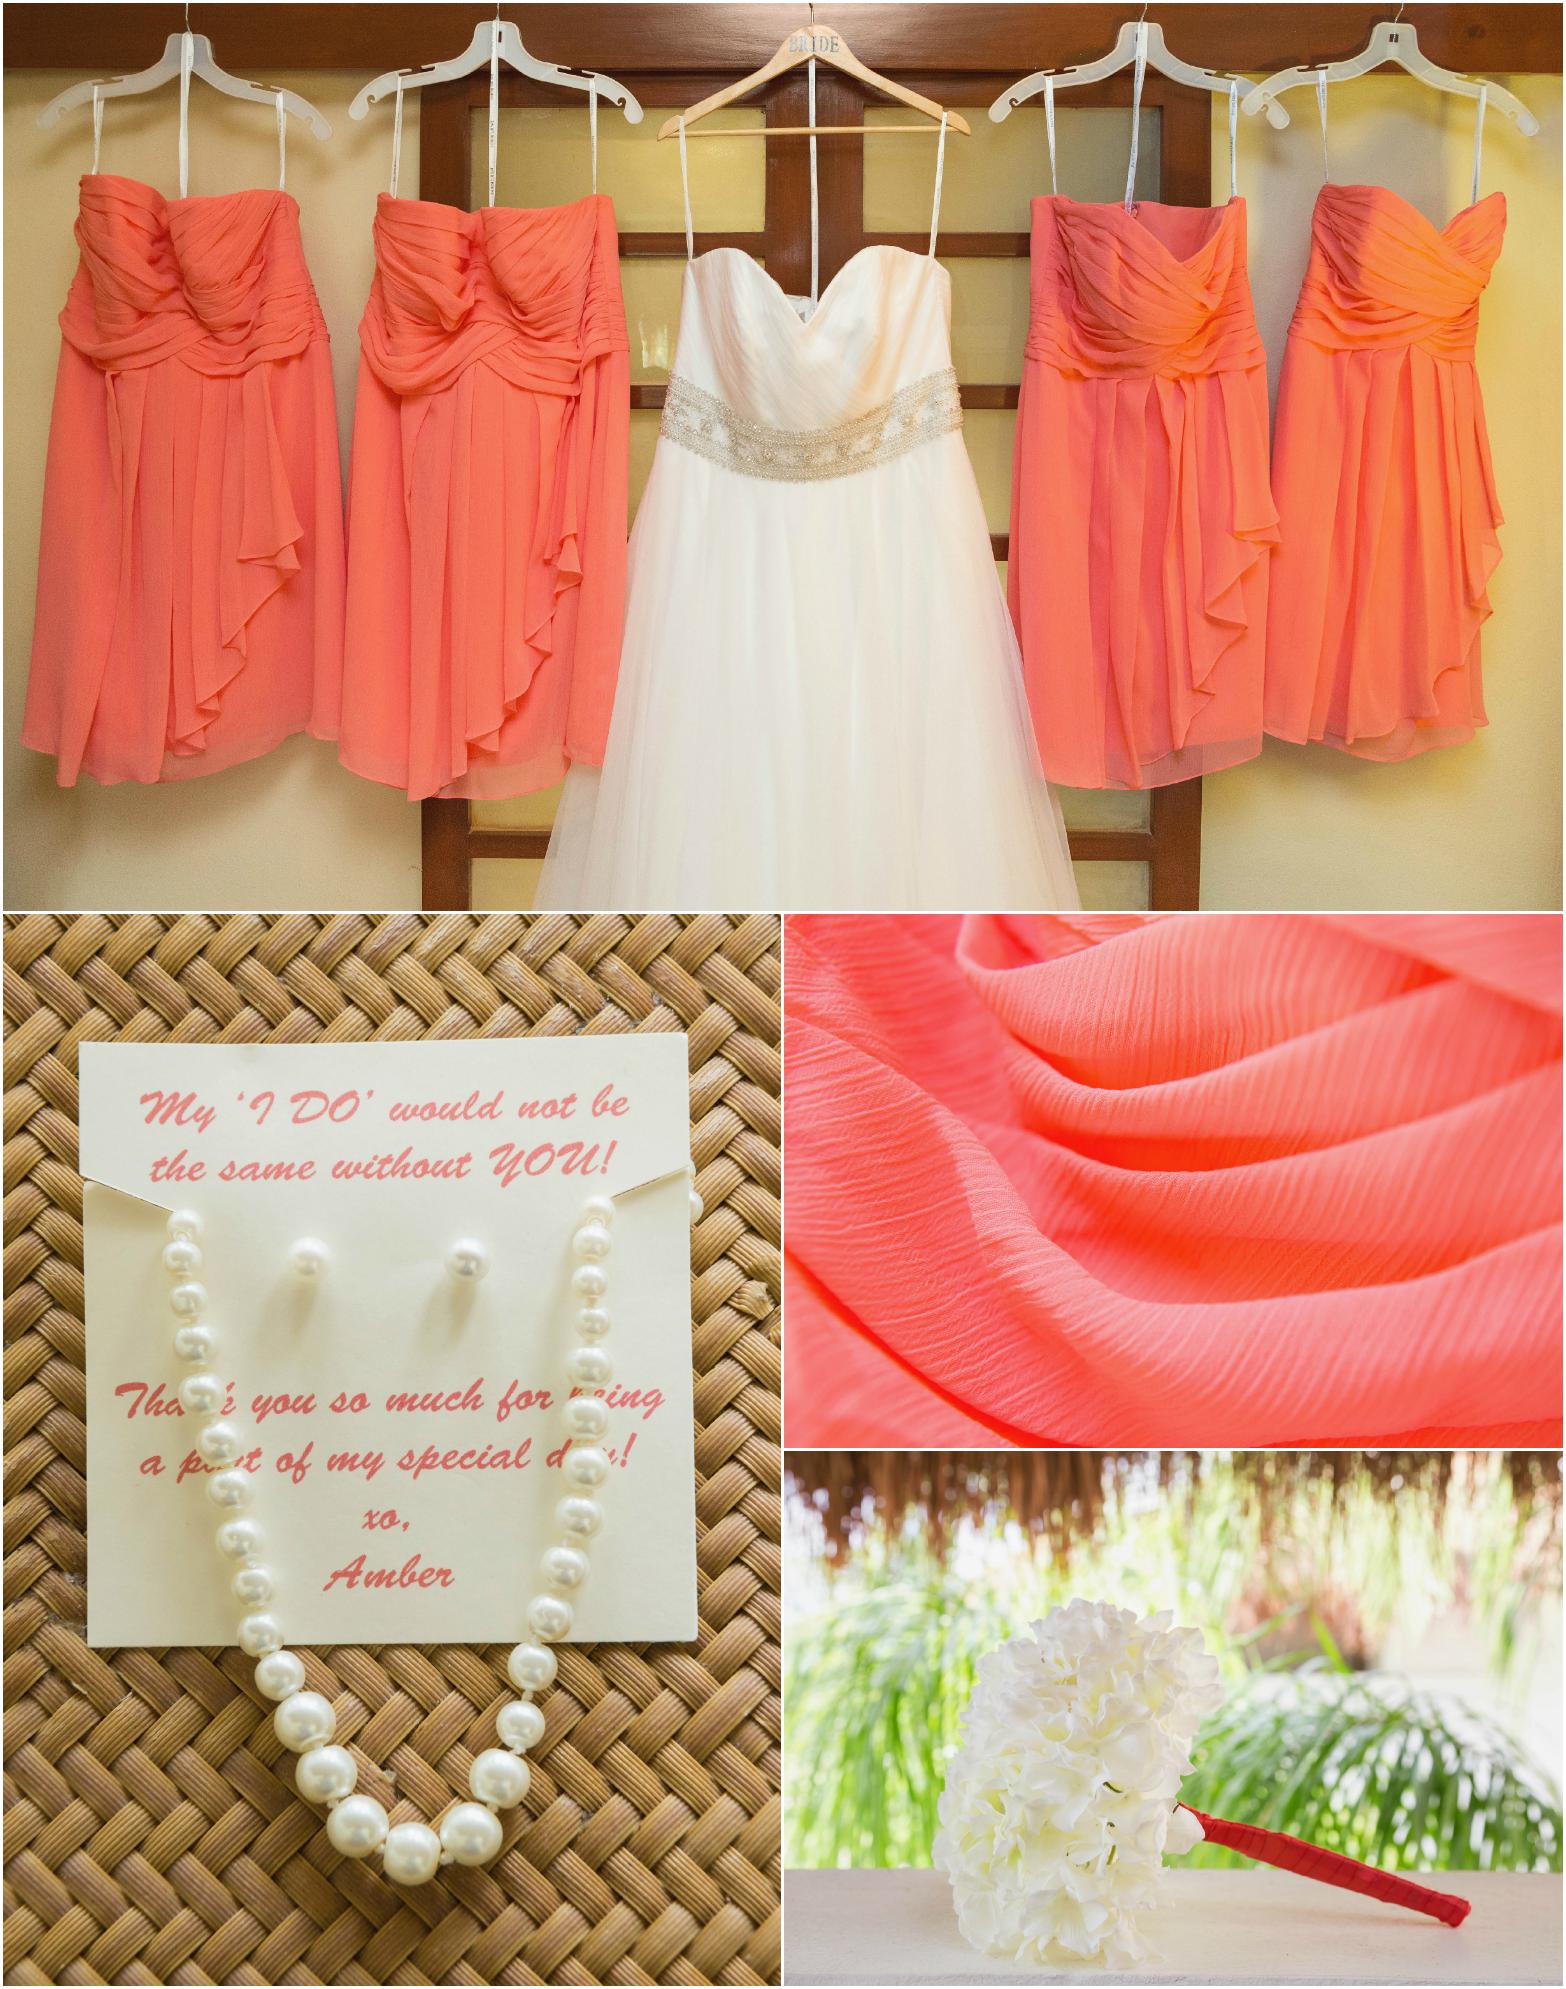 cancun_wedding3.png